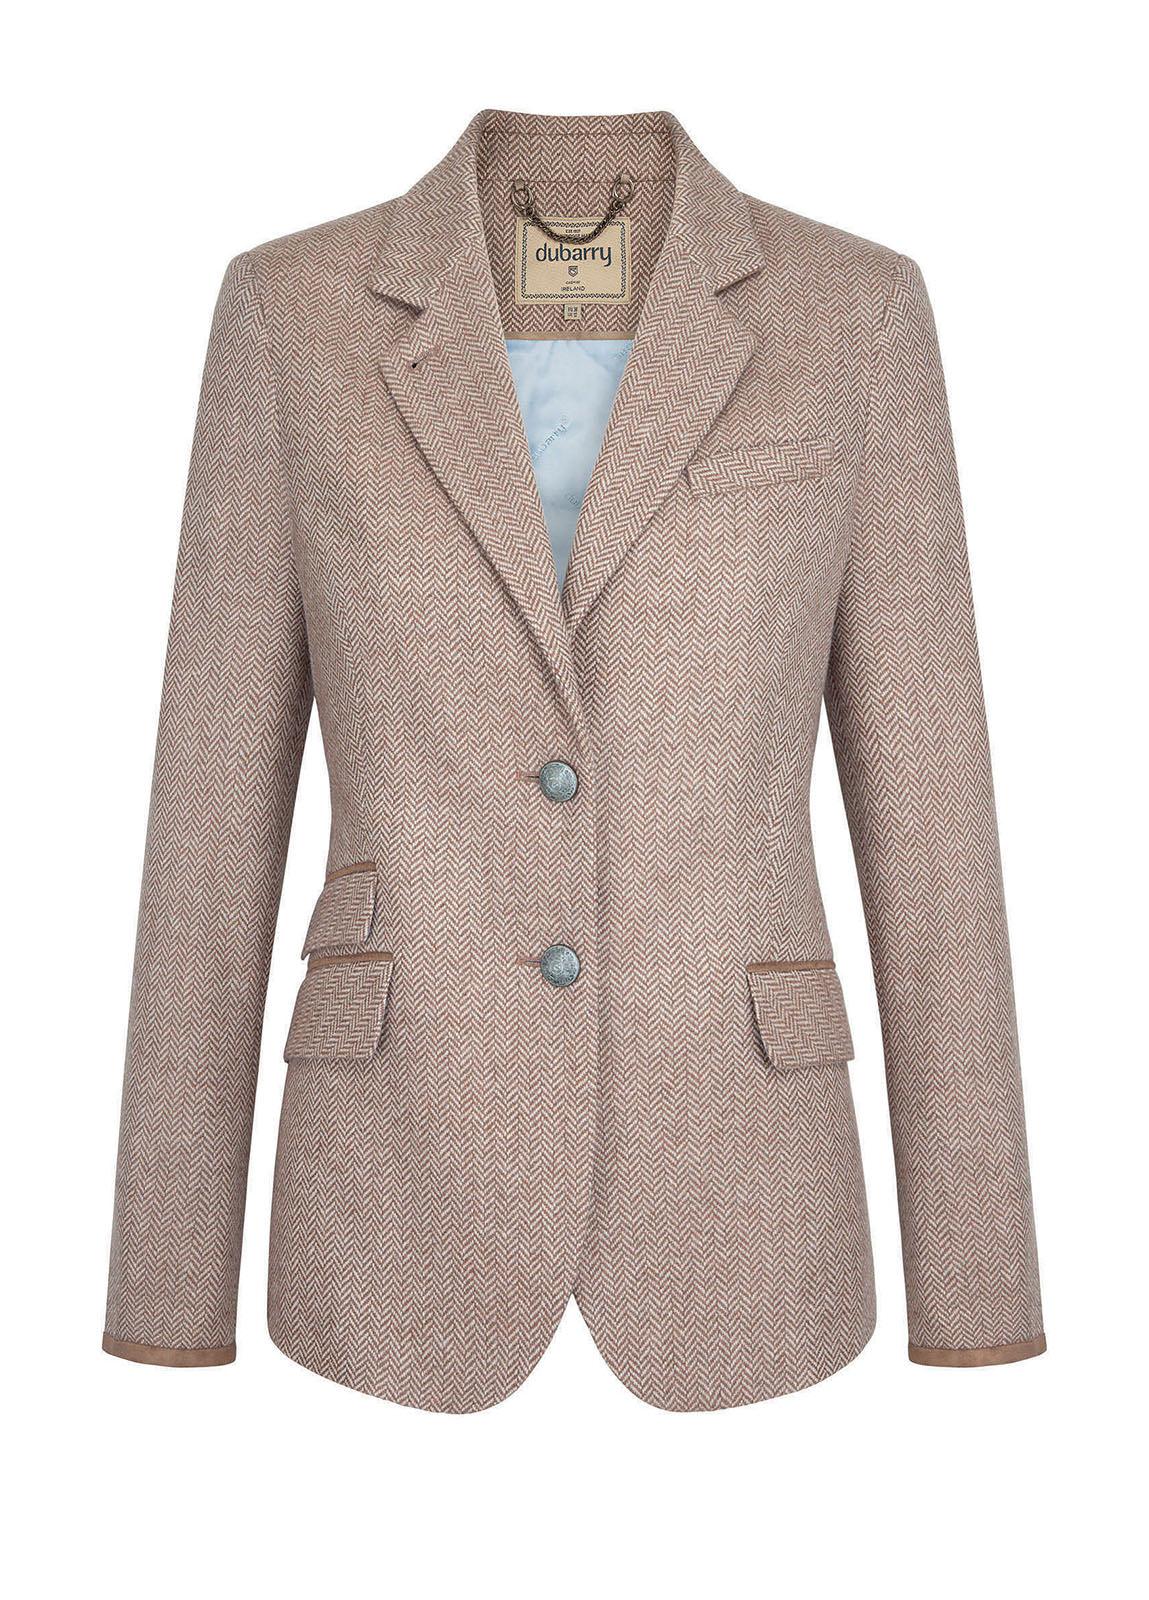 Dubarry_Birch Women's Tweed Jacket - Camel_Image_2